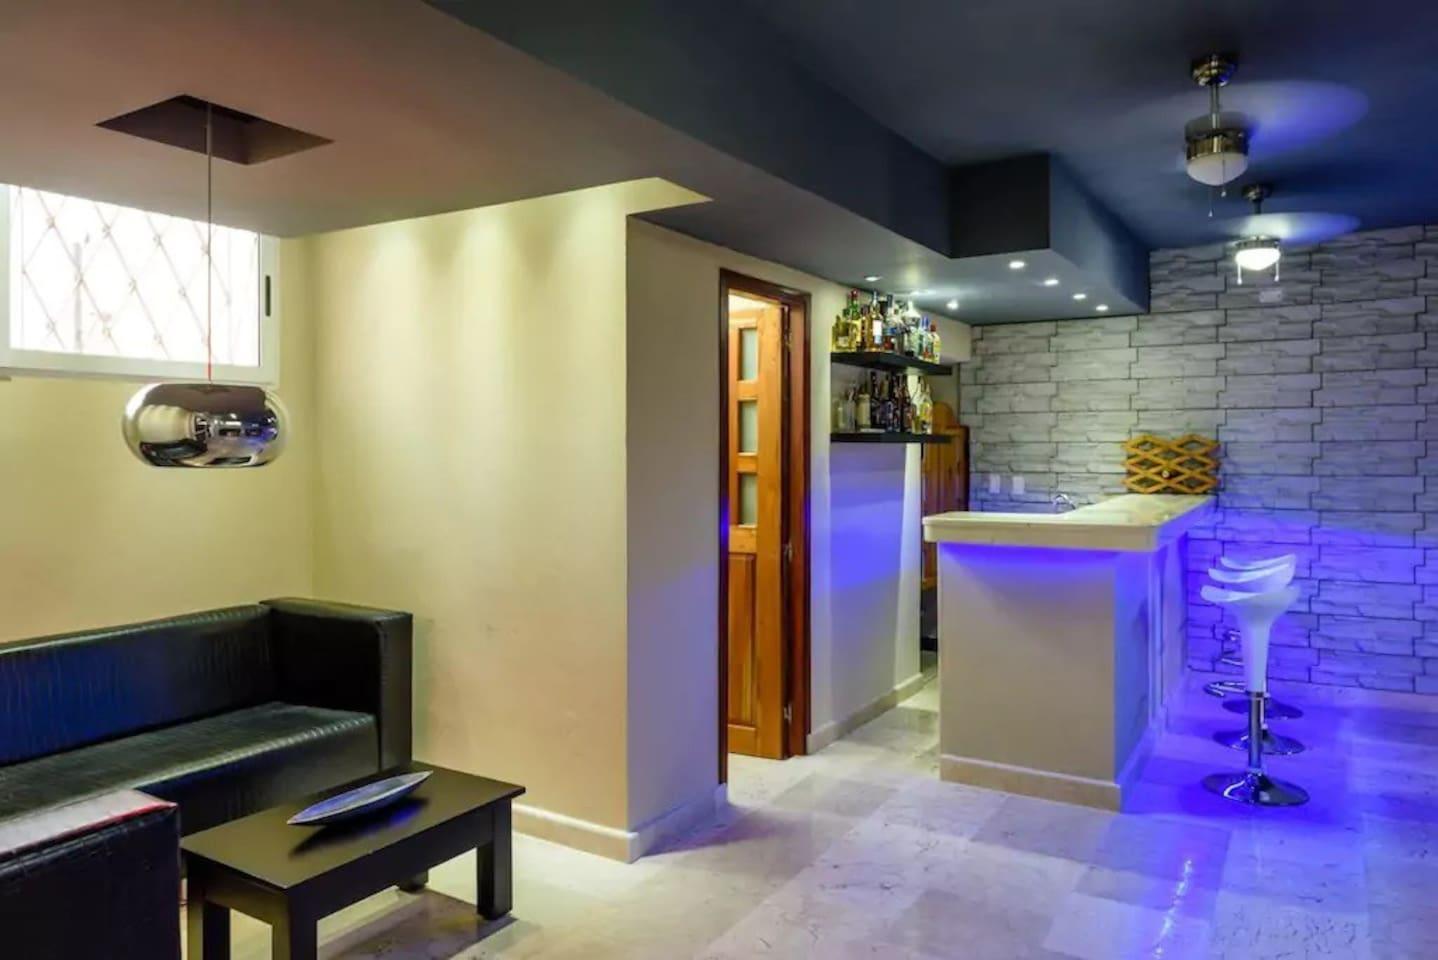 Apartment Villa Don Teto Suite   8 Rooms  Great Havana View photo 16521631